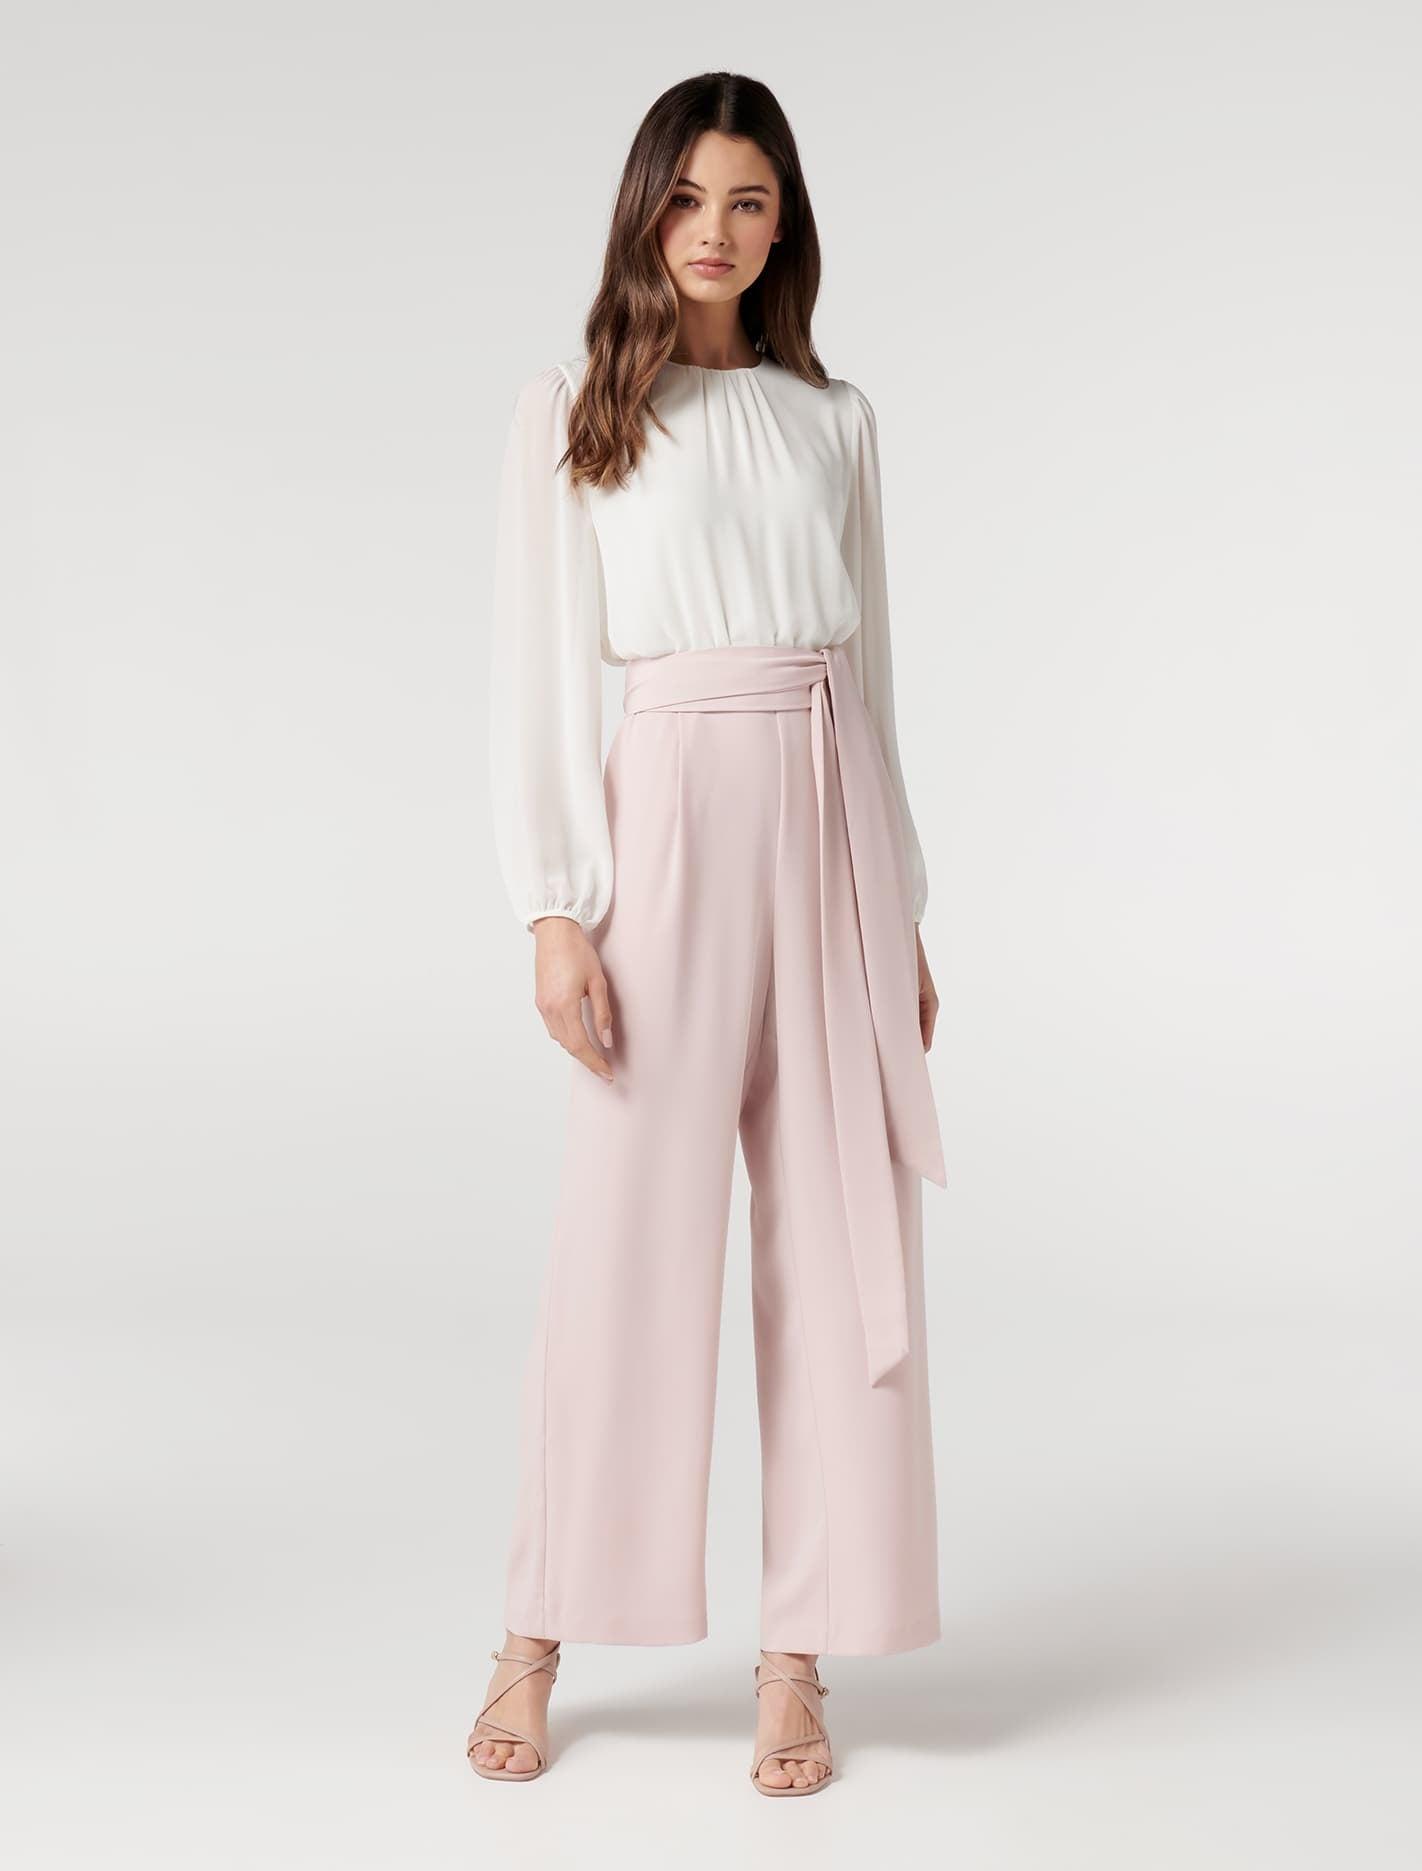 Ever New Ivy Petite Long Sleeve Jumpsuit - Ivory / Blush